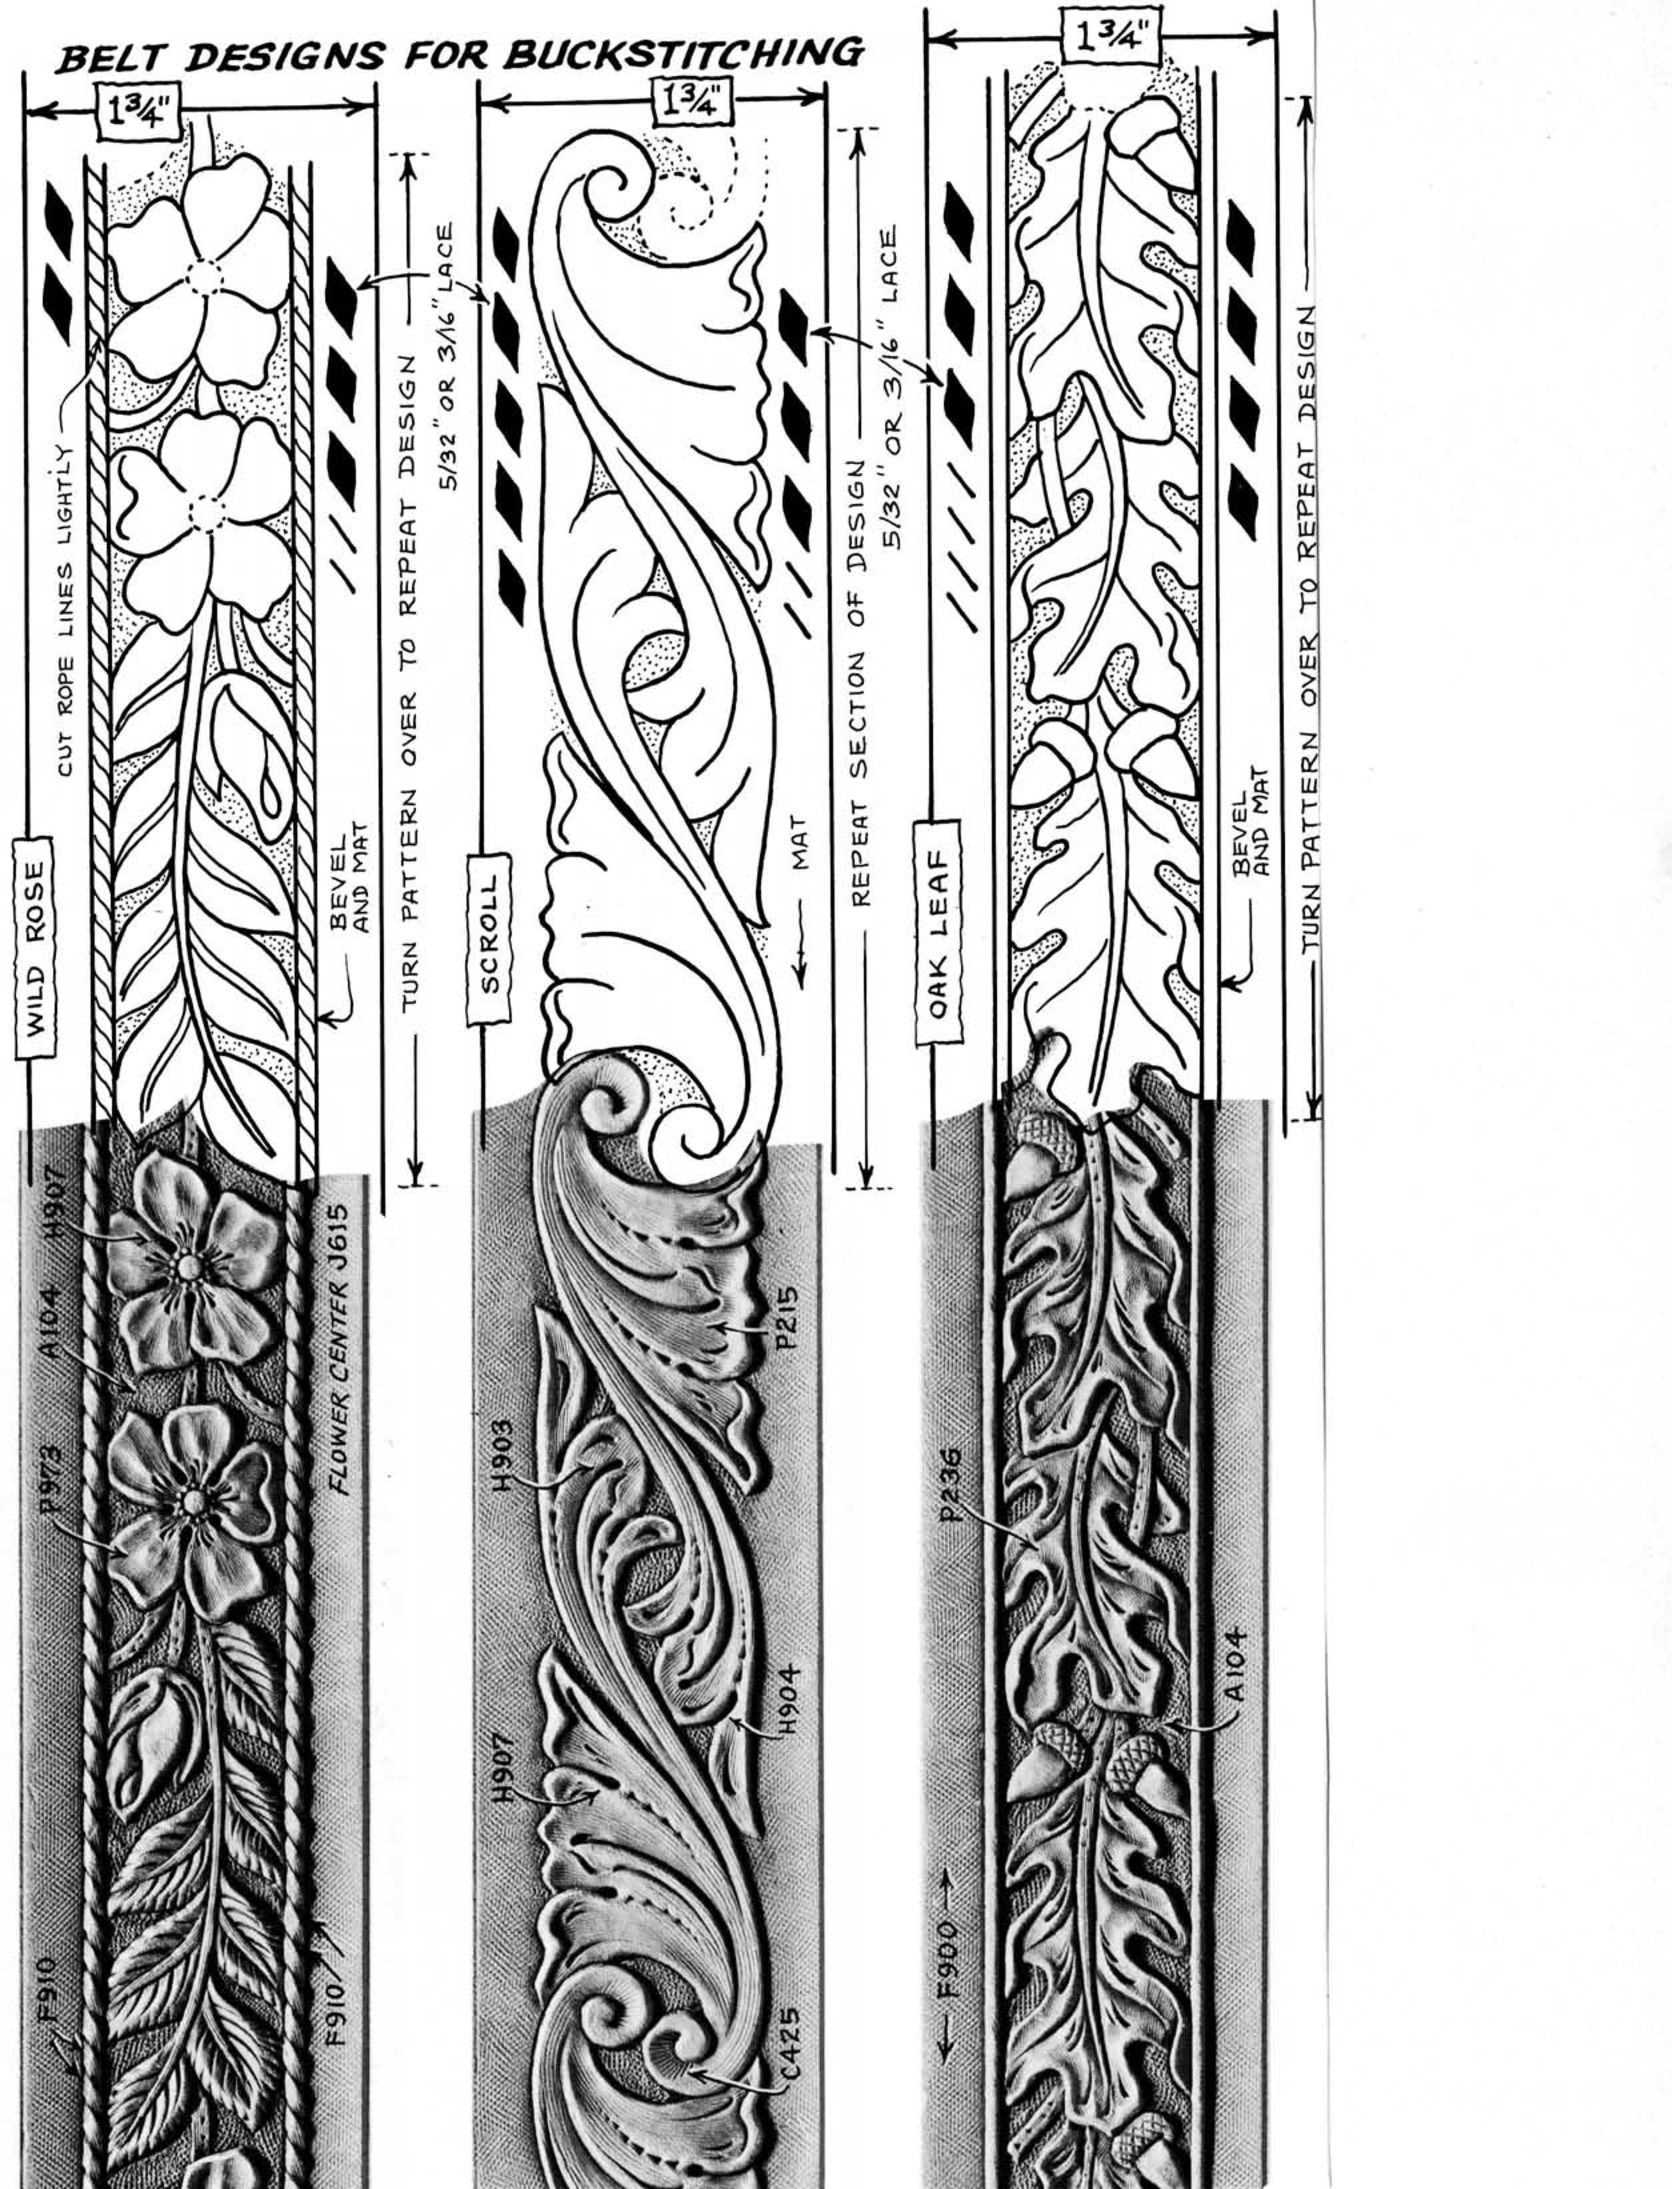 Free Leather Tooling Patterns - Yahoo Image Search Results - Free Printable Leather Belt Tooling Patterns